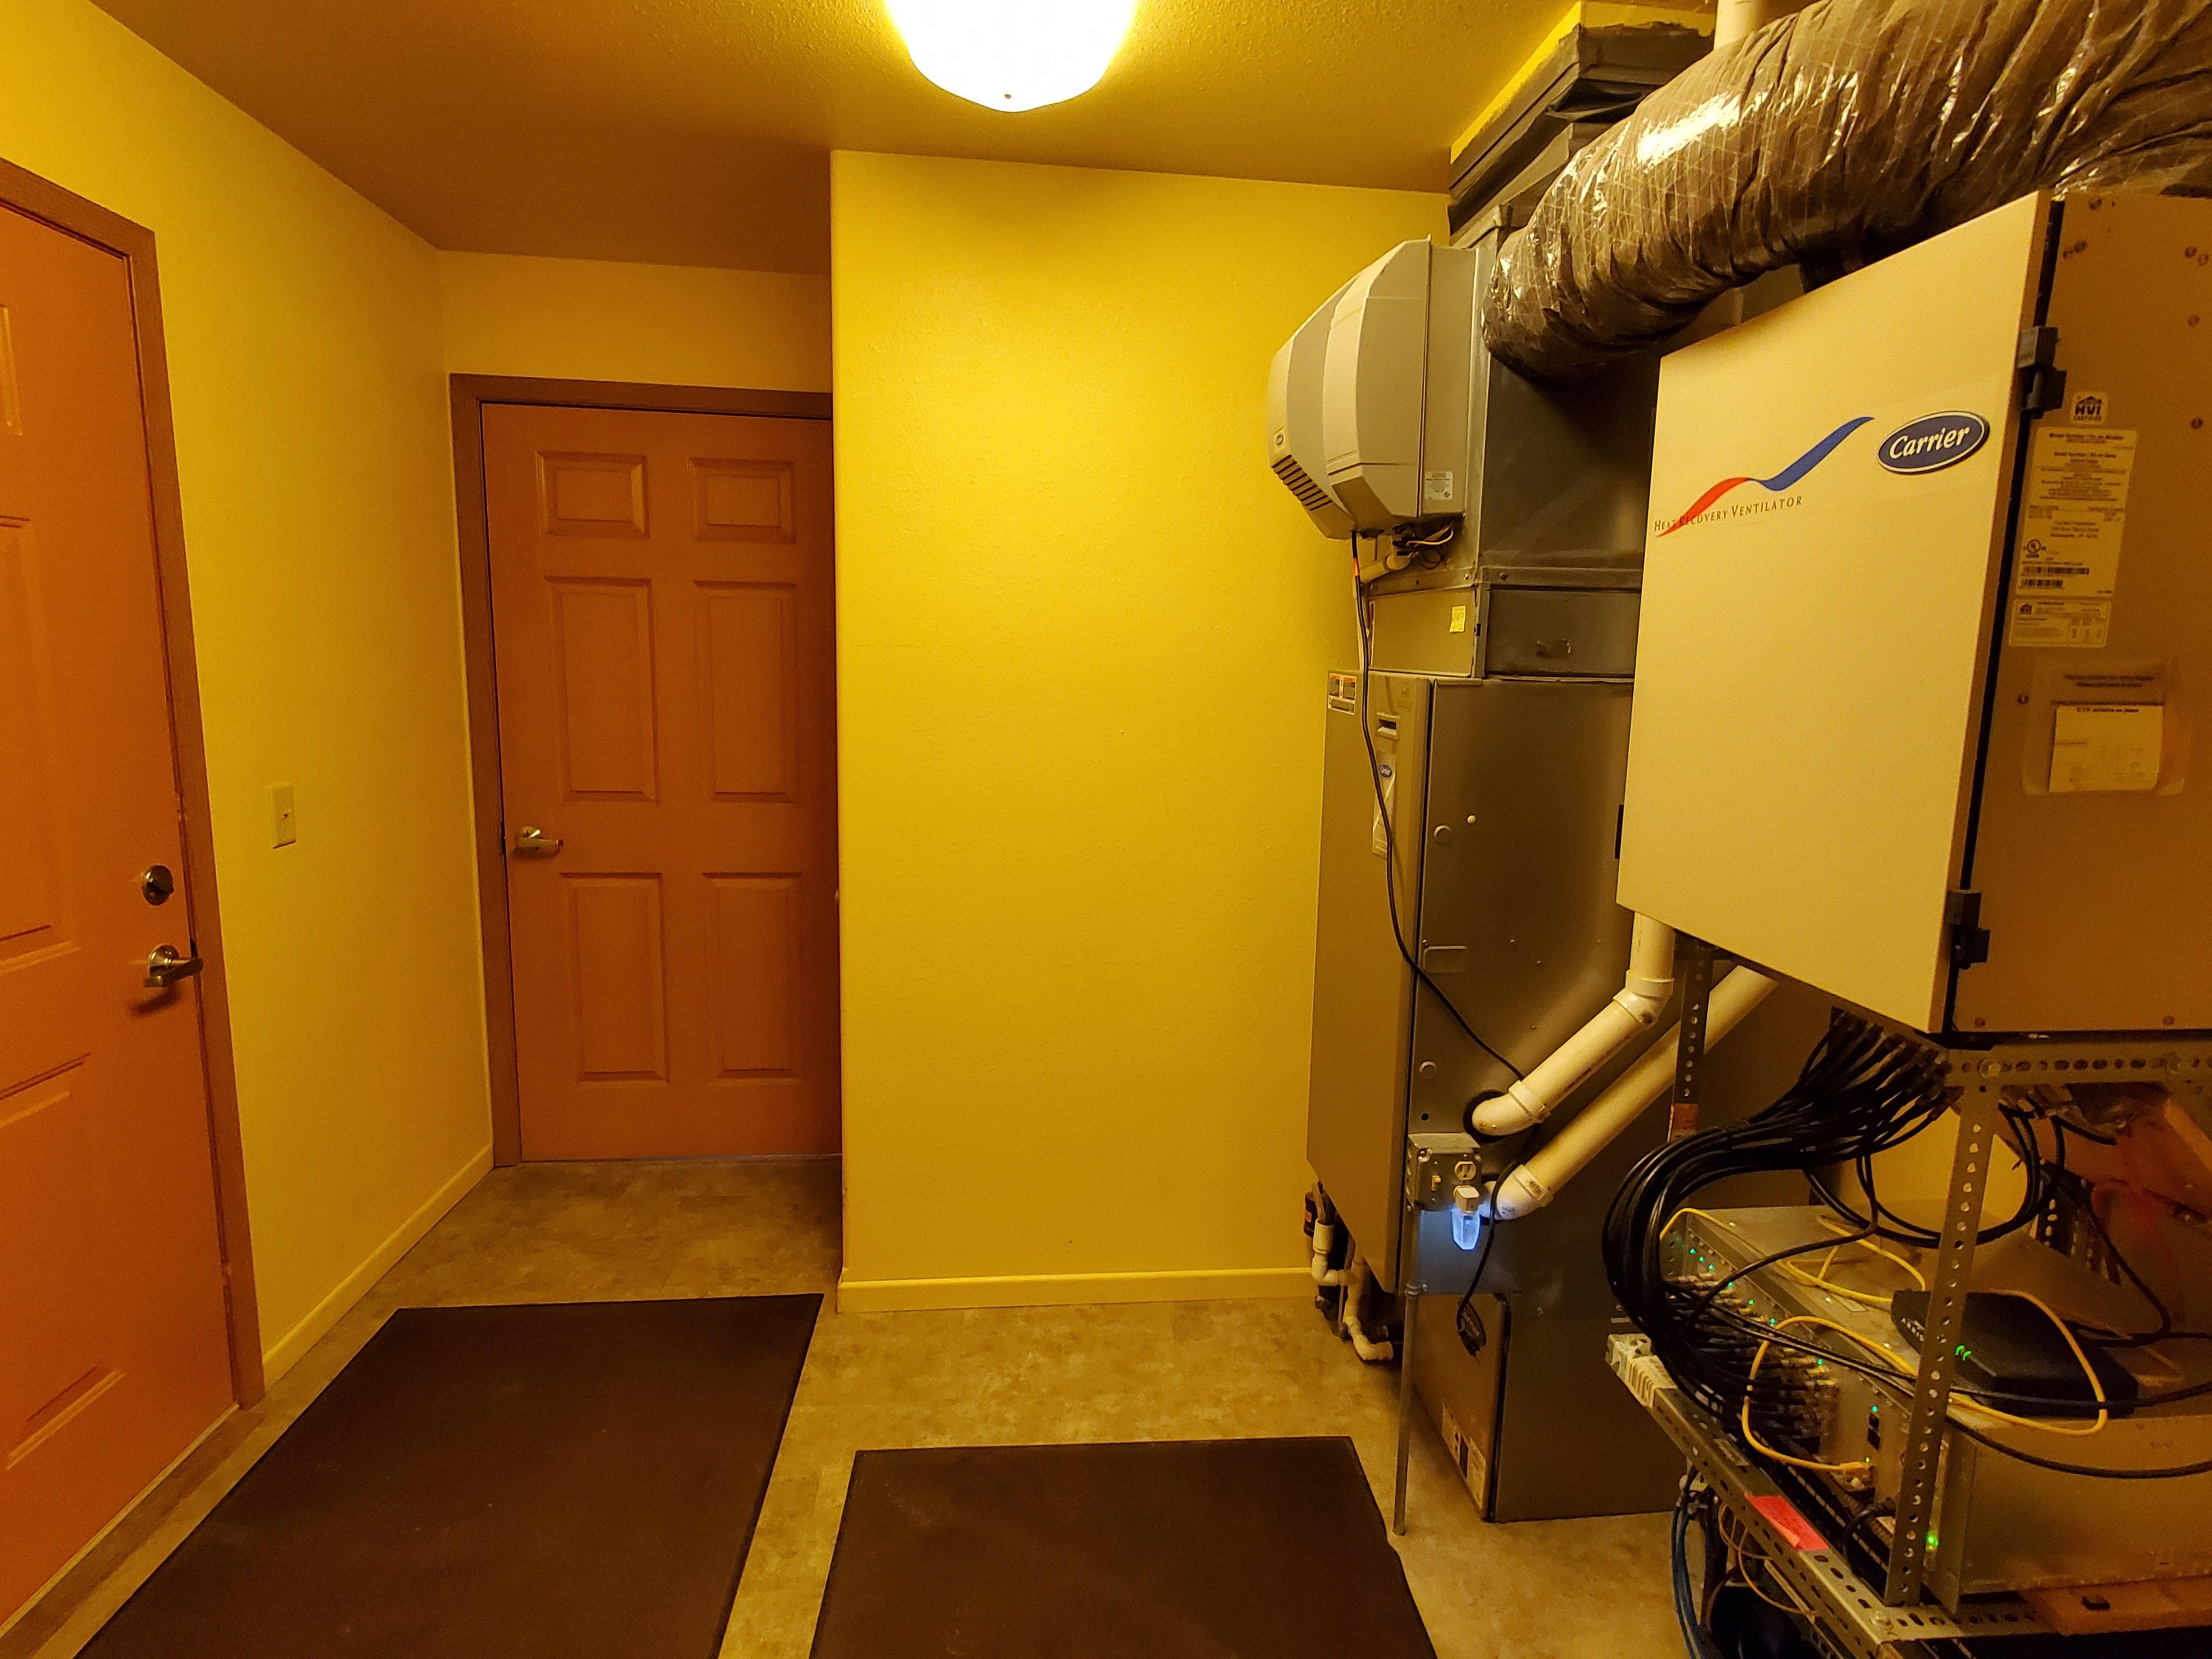 Motel Utility Room & Ice Maker